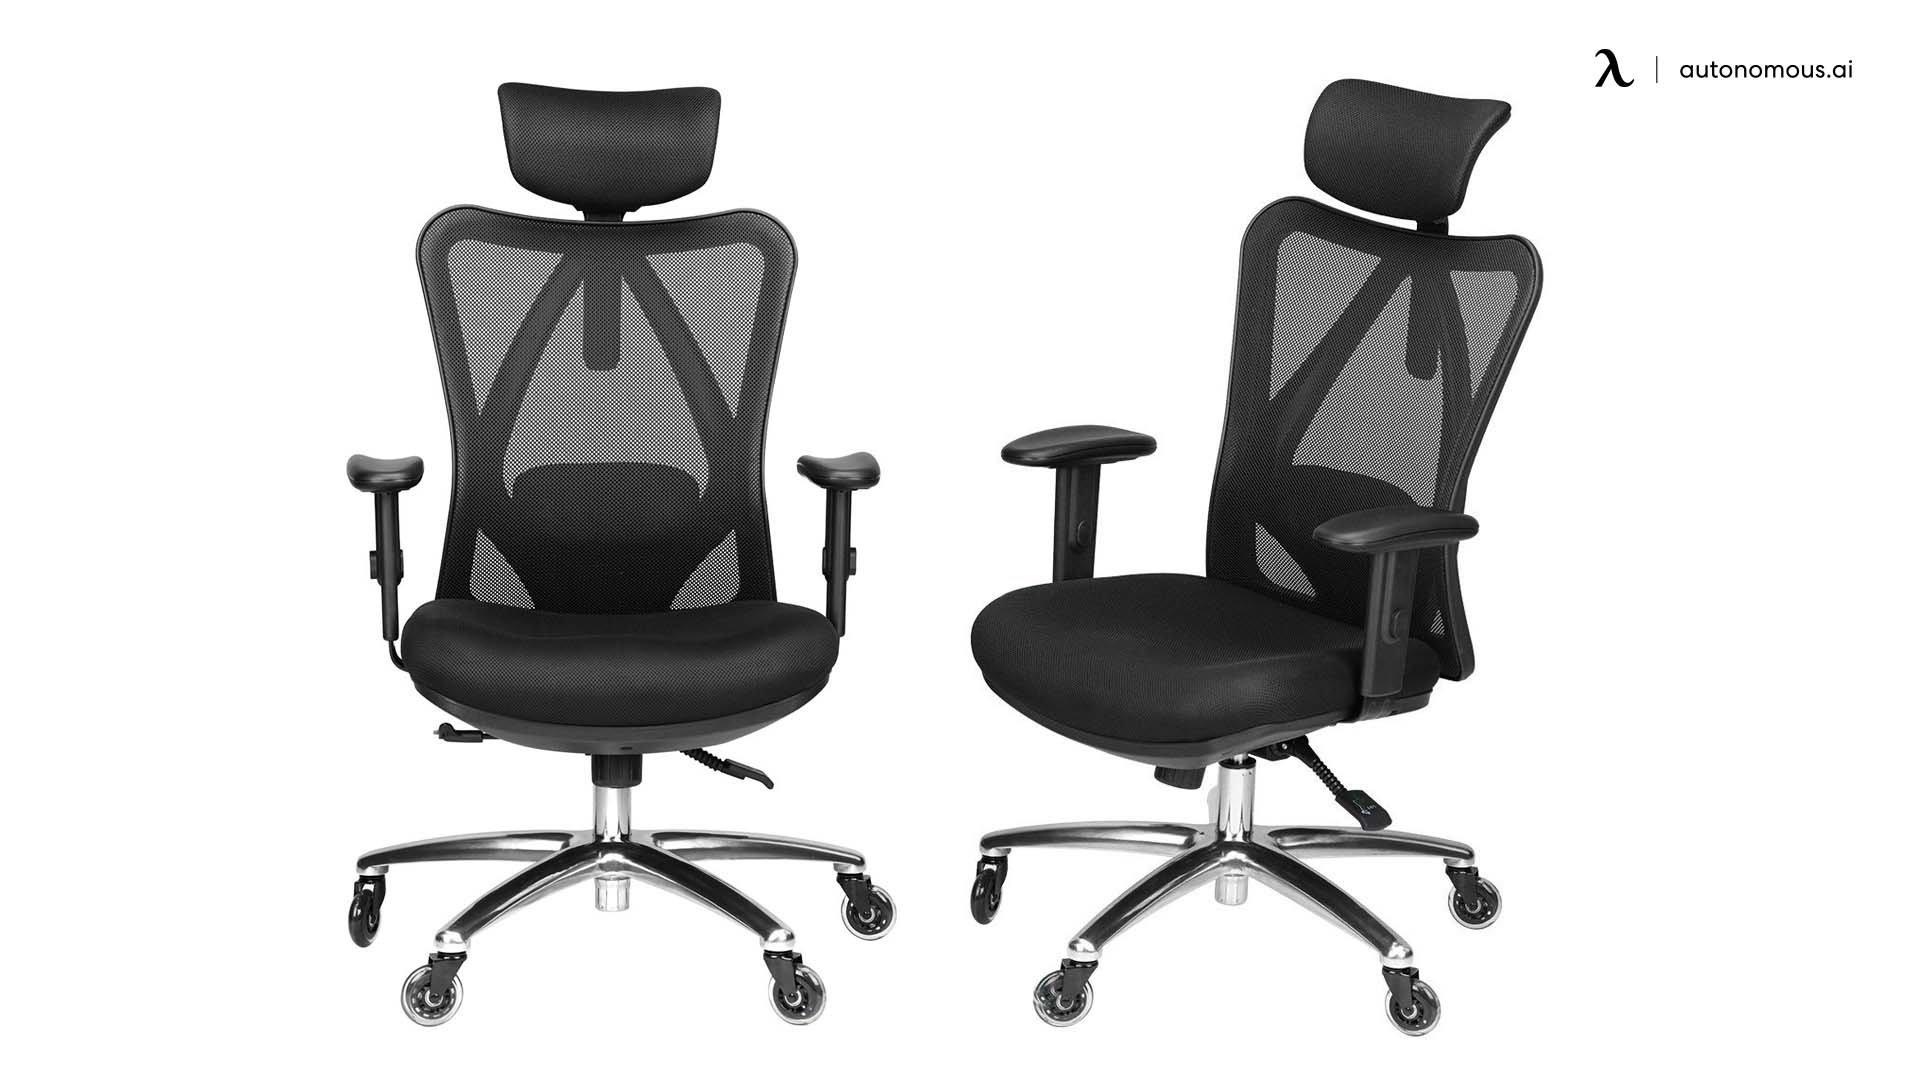 Duramont Ergonomic Adjustable Office Chair